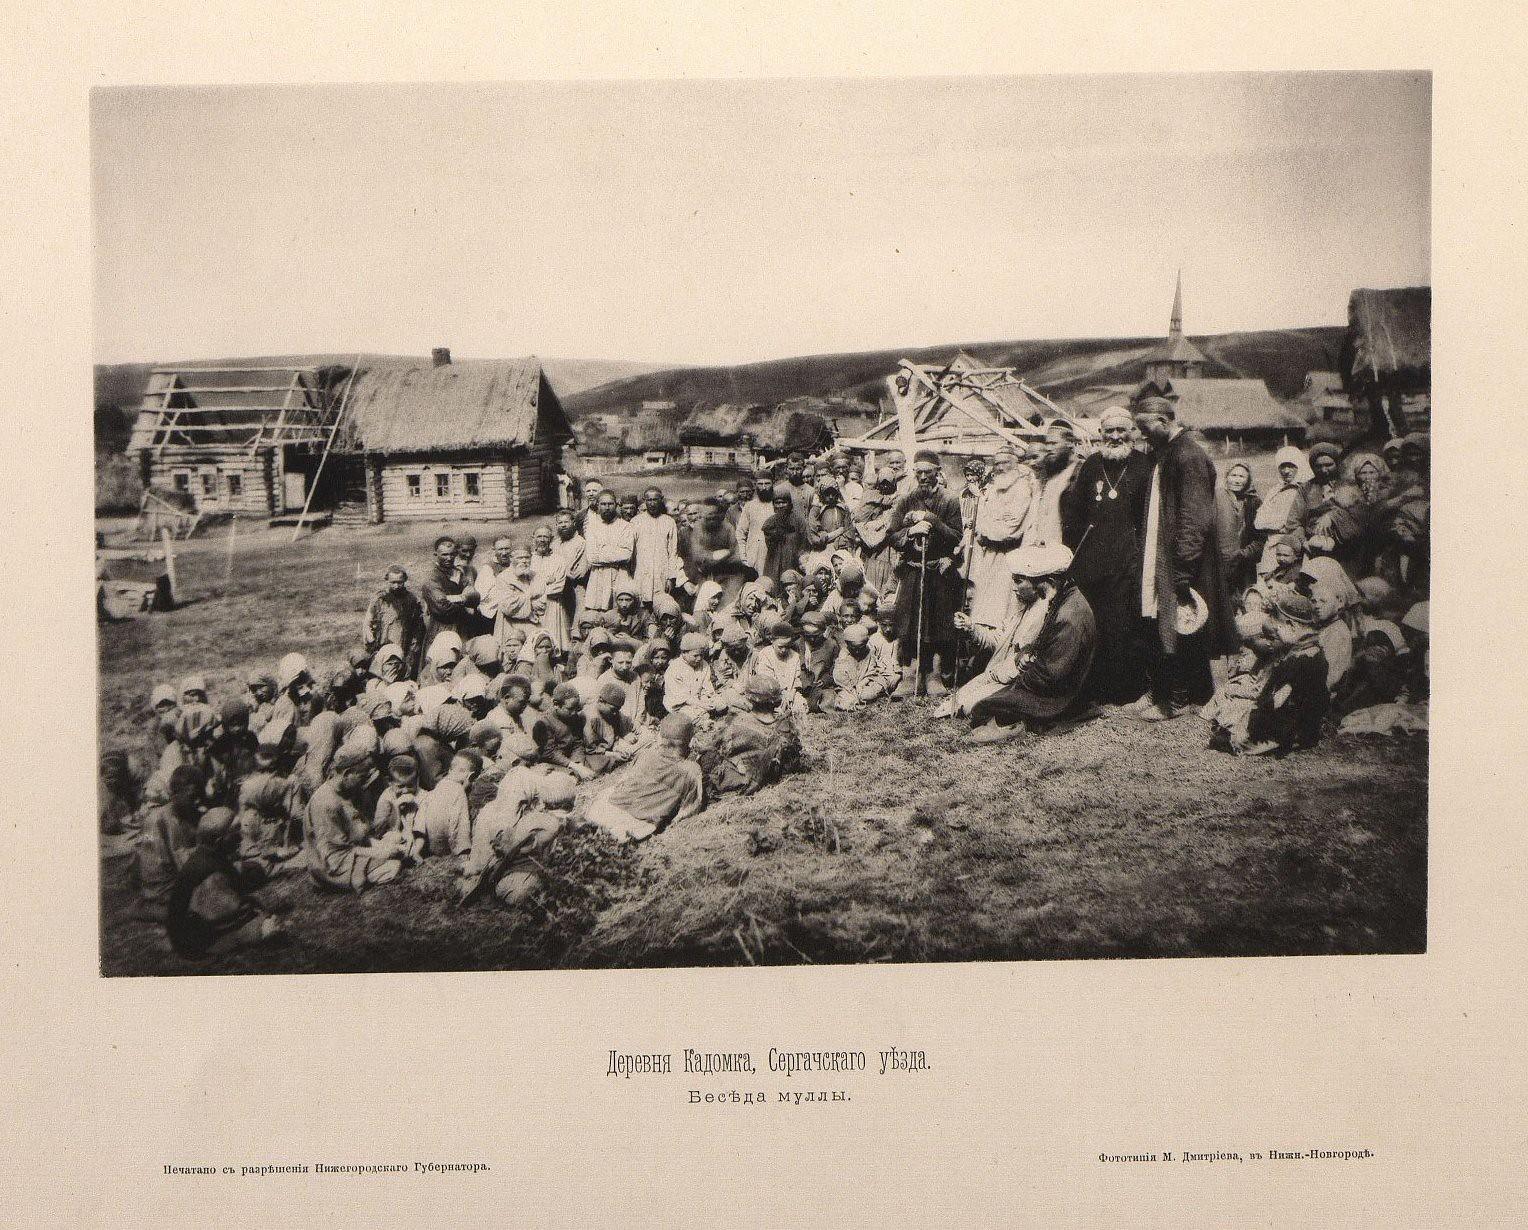 14. Деревня Кадомка Сергачского уезда. Беседа муллы